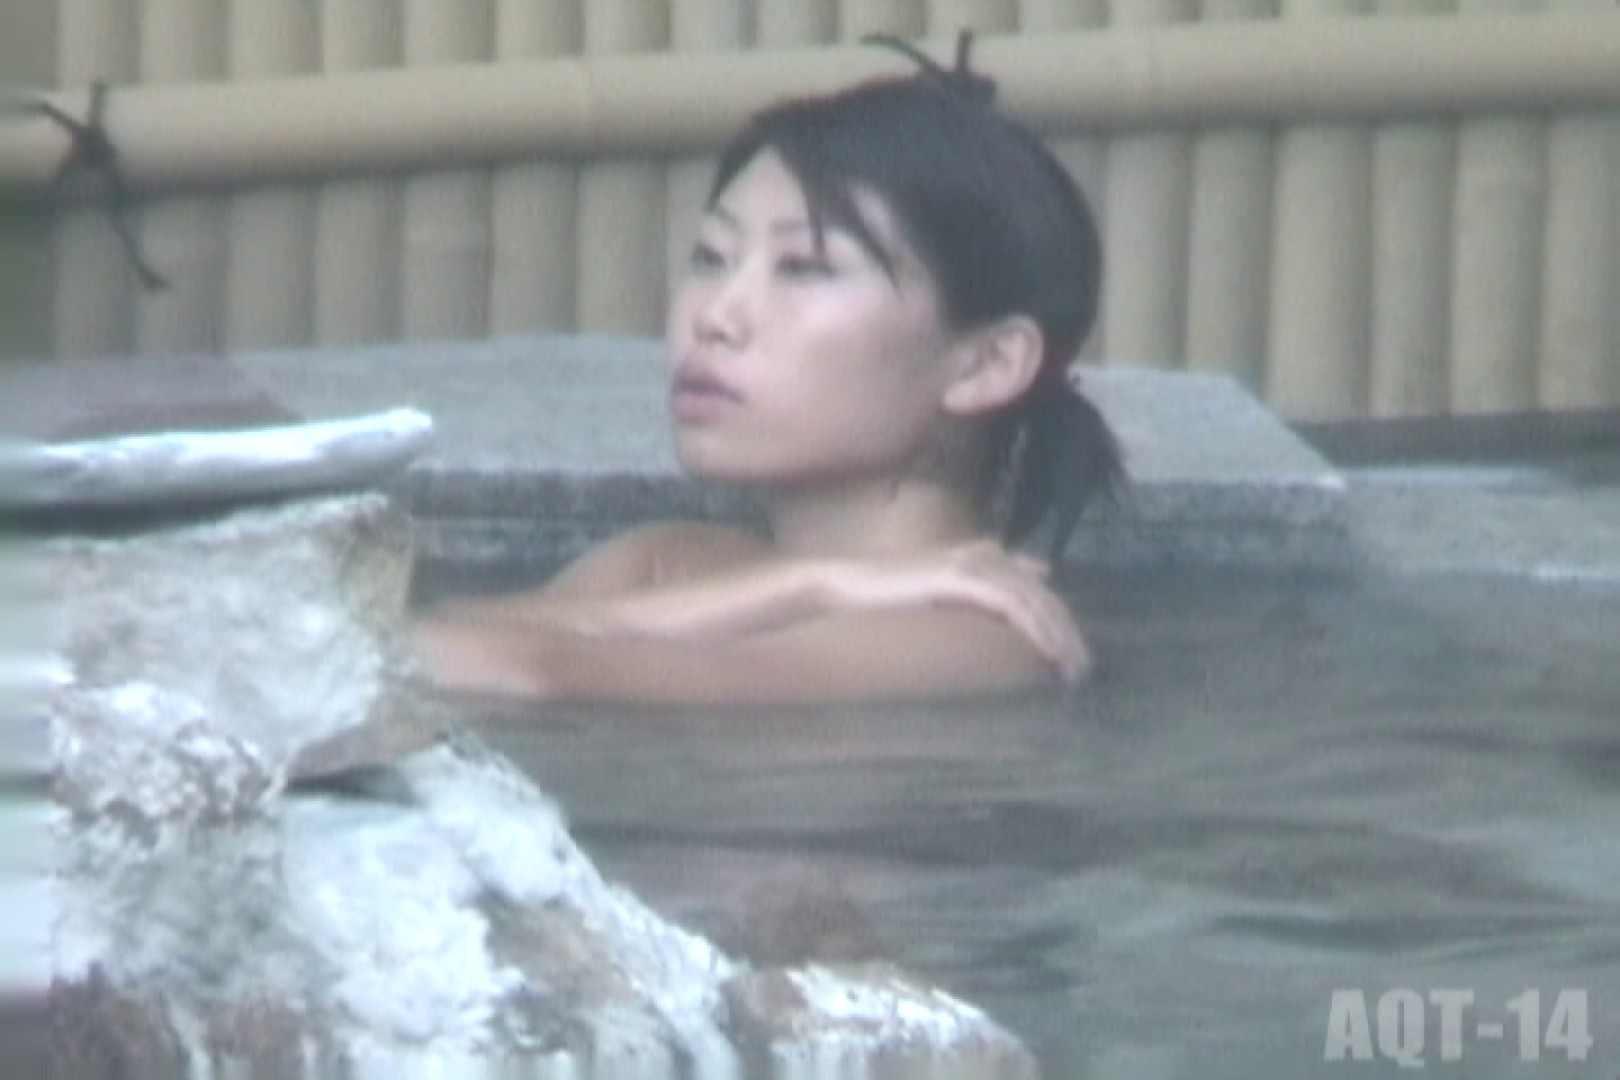 Aquaな露天風呂Vol.820 盗撮師作品  104pic 9